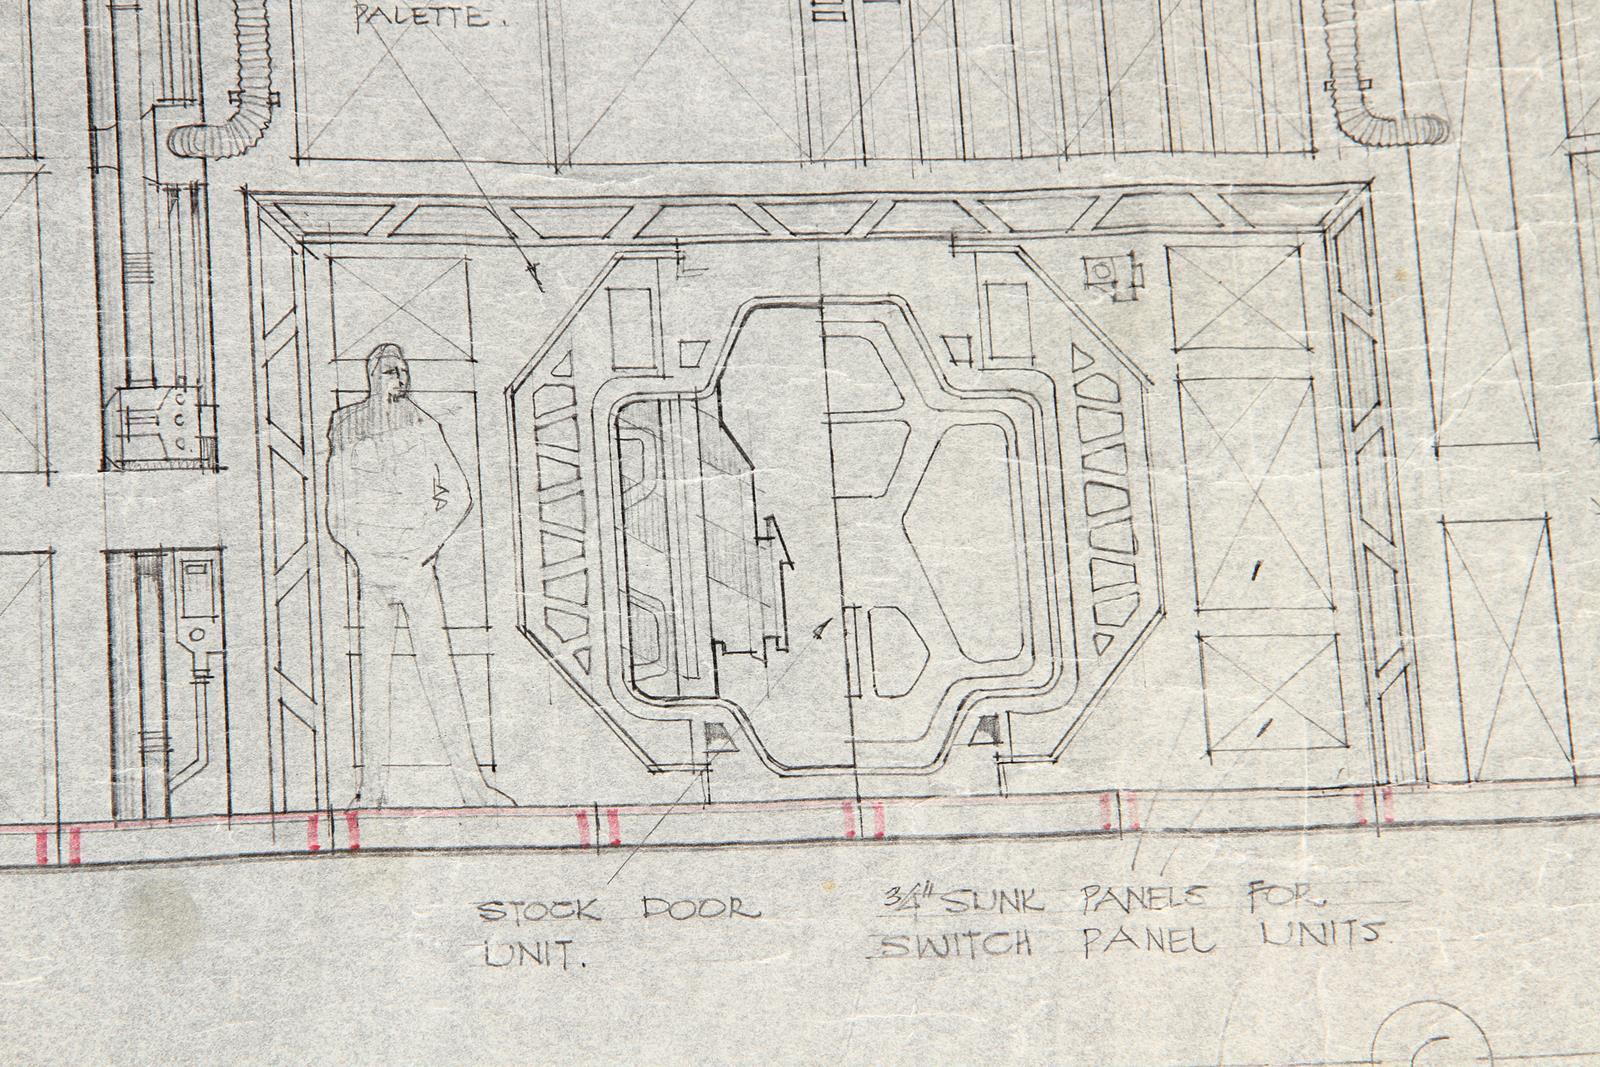 ALIEN (1979) - Hand-Drawn Nostromo Hangar Pencil Illustration A hand-drawn pencil set illustration - Image 2 of 11